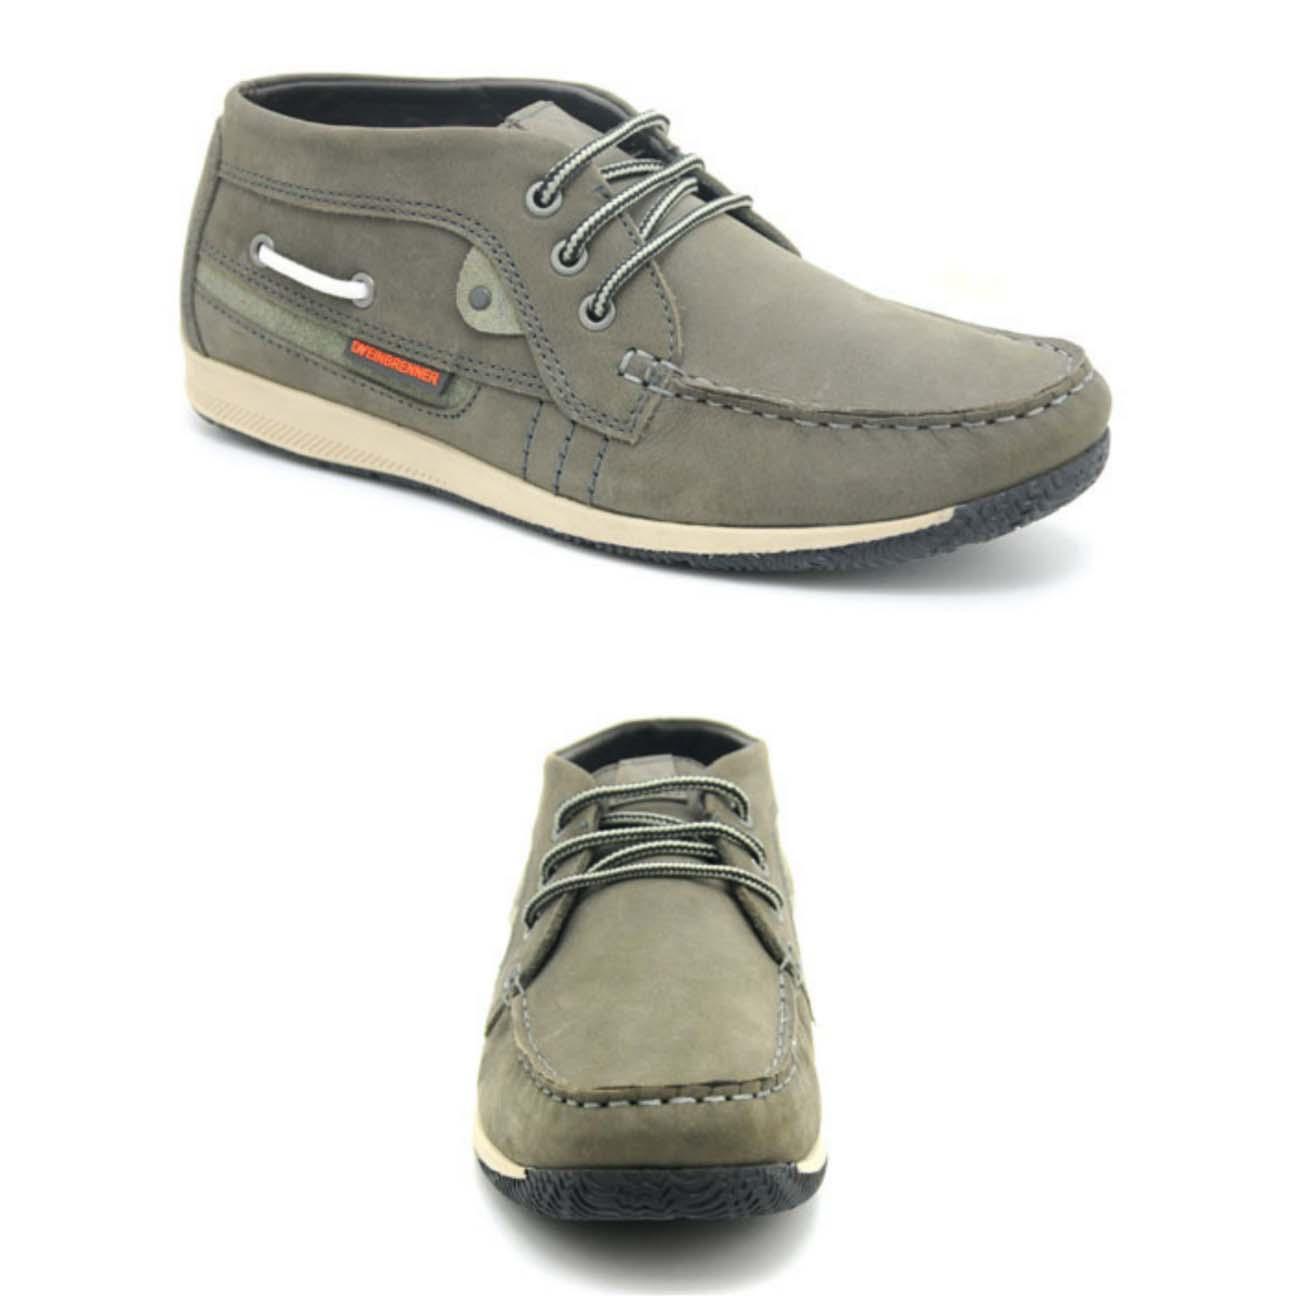 30e81a4e539 Men casual shoes for winter 2016… styloplanet (3)